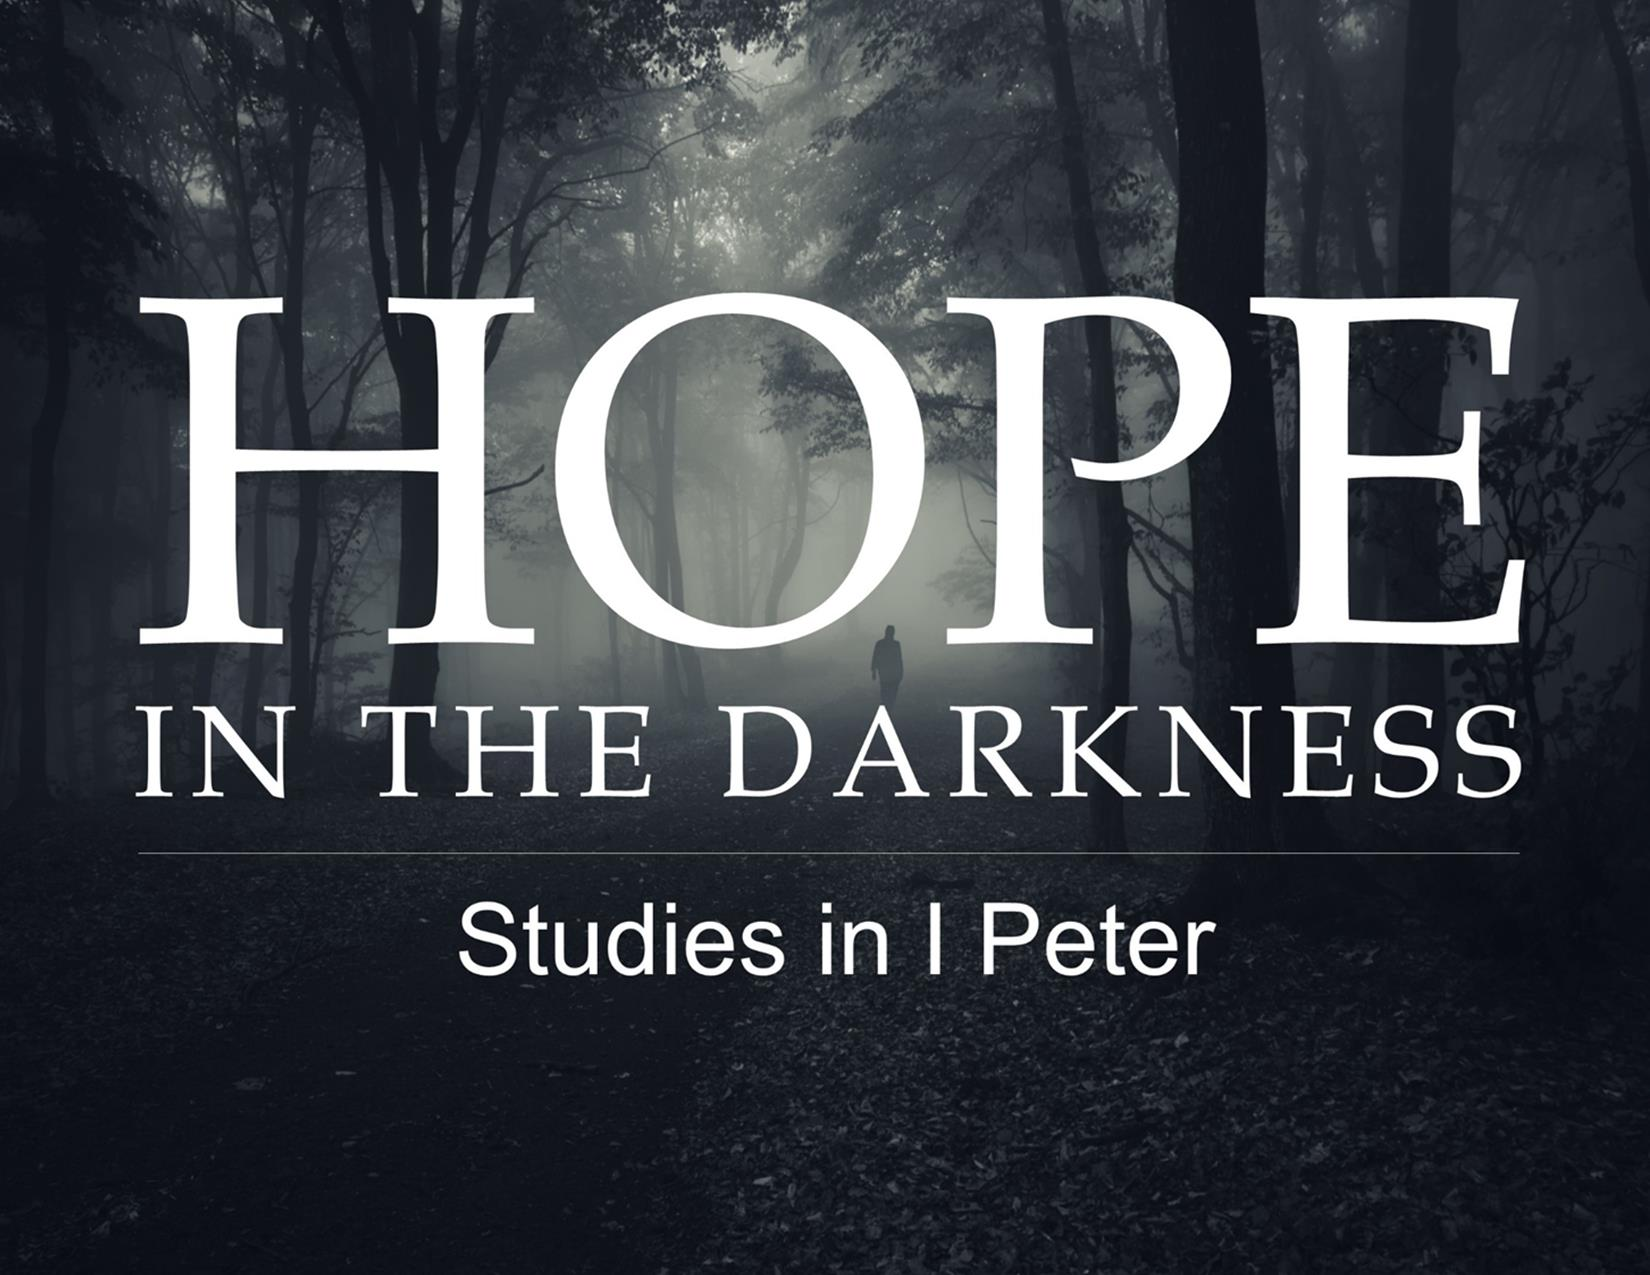 March 27, 2016 (Easter Sunday) ~ Gospel Shaped Fear (1 Peter 1:17-21) ~ Pastor Jason Pilchard